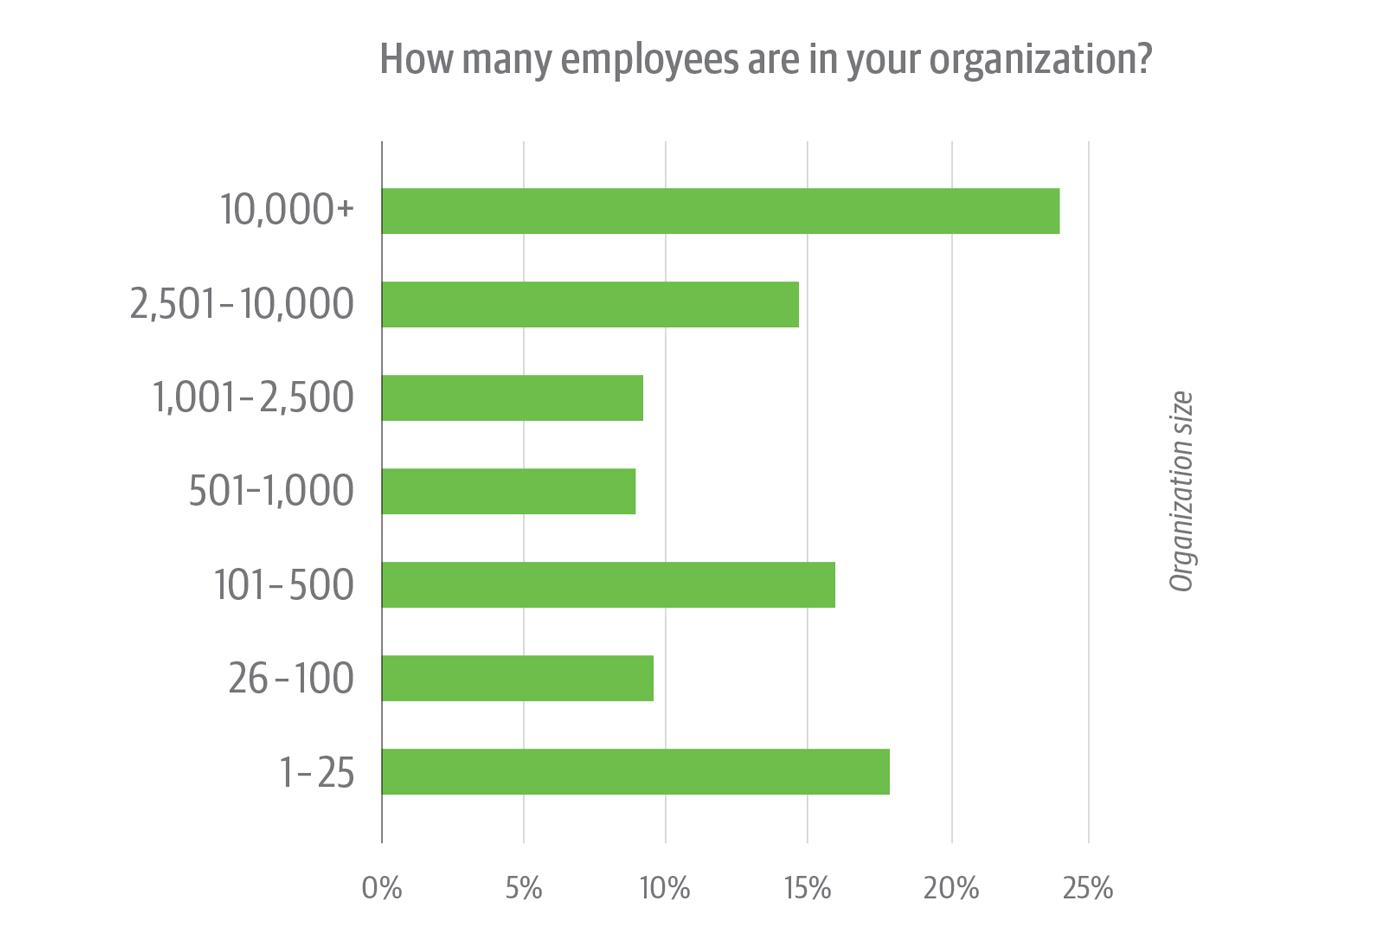 Organization size